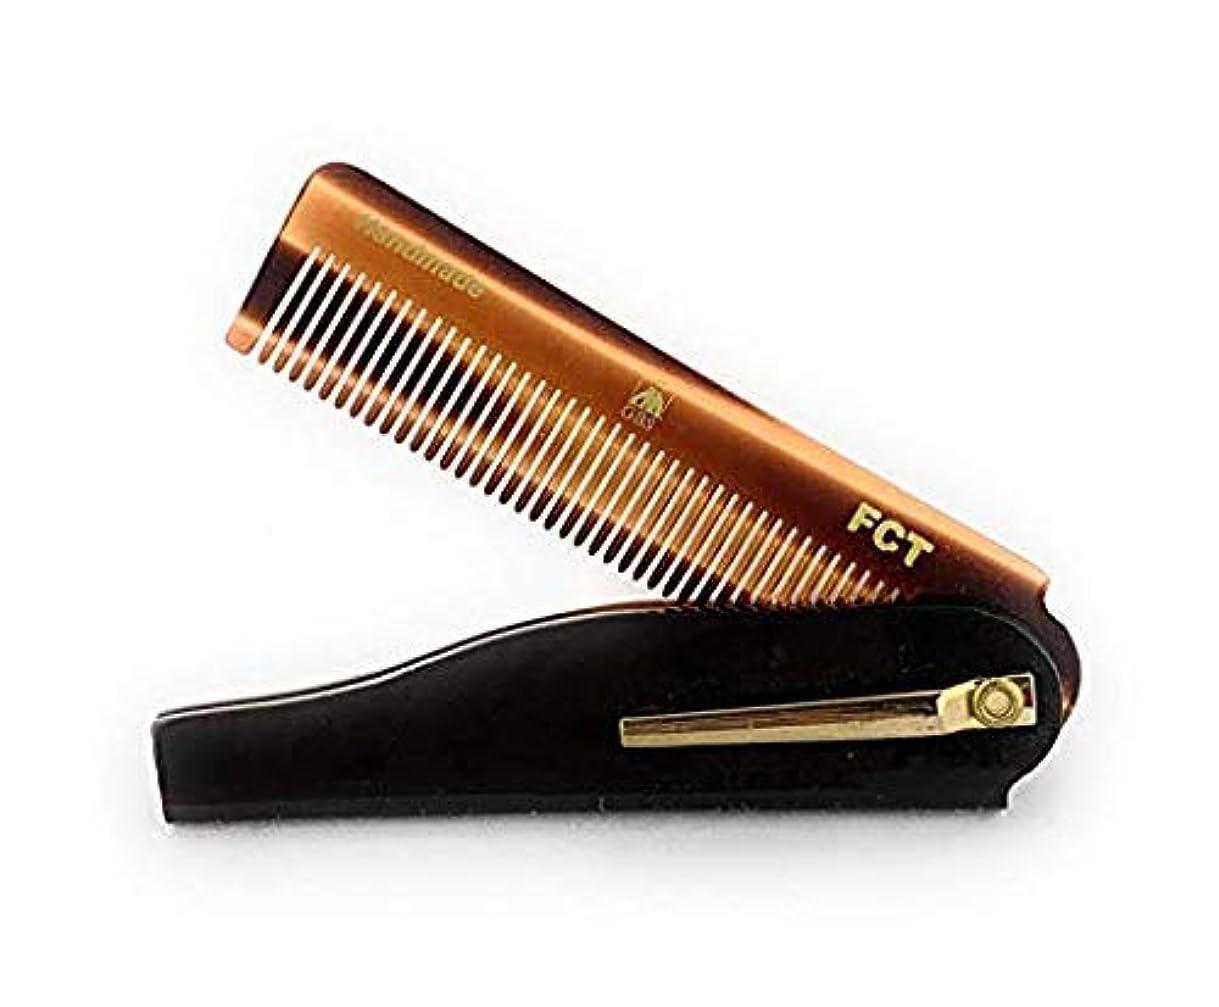 責任害虫大混乱GBS Men's Folding Anti-Static No Snag All Purpose Hair and Beard Tortoise Comb- Handmade Sawcut - 100mm Fine Teeth...